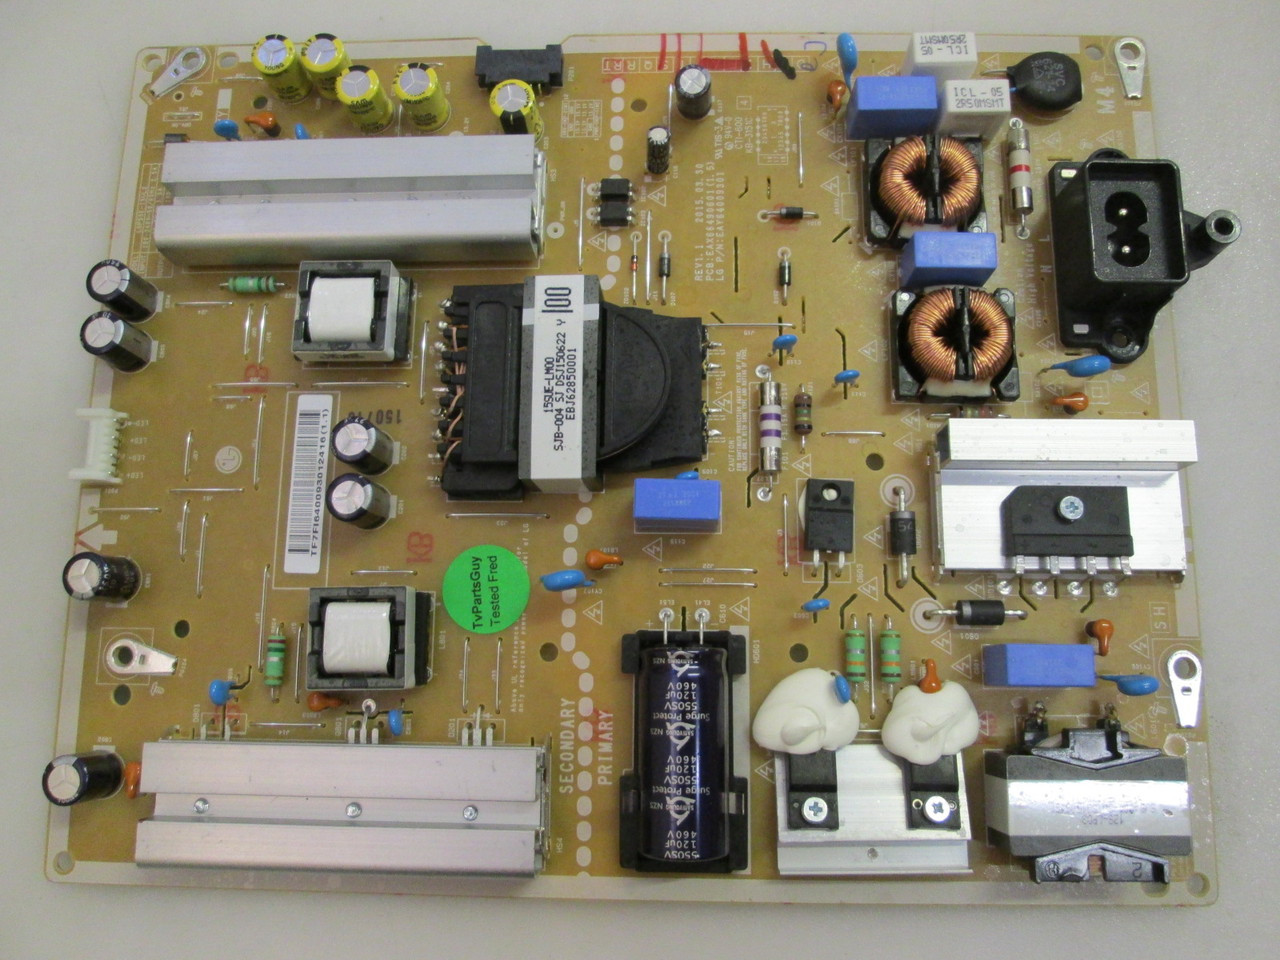 LG EAY64009301 EAX66490601 55UF6450-UA POWER SUPPLY